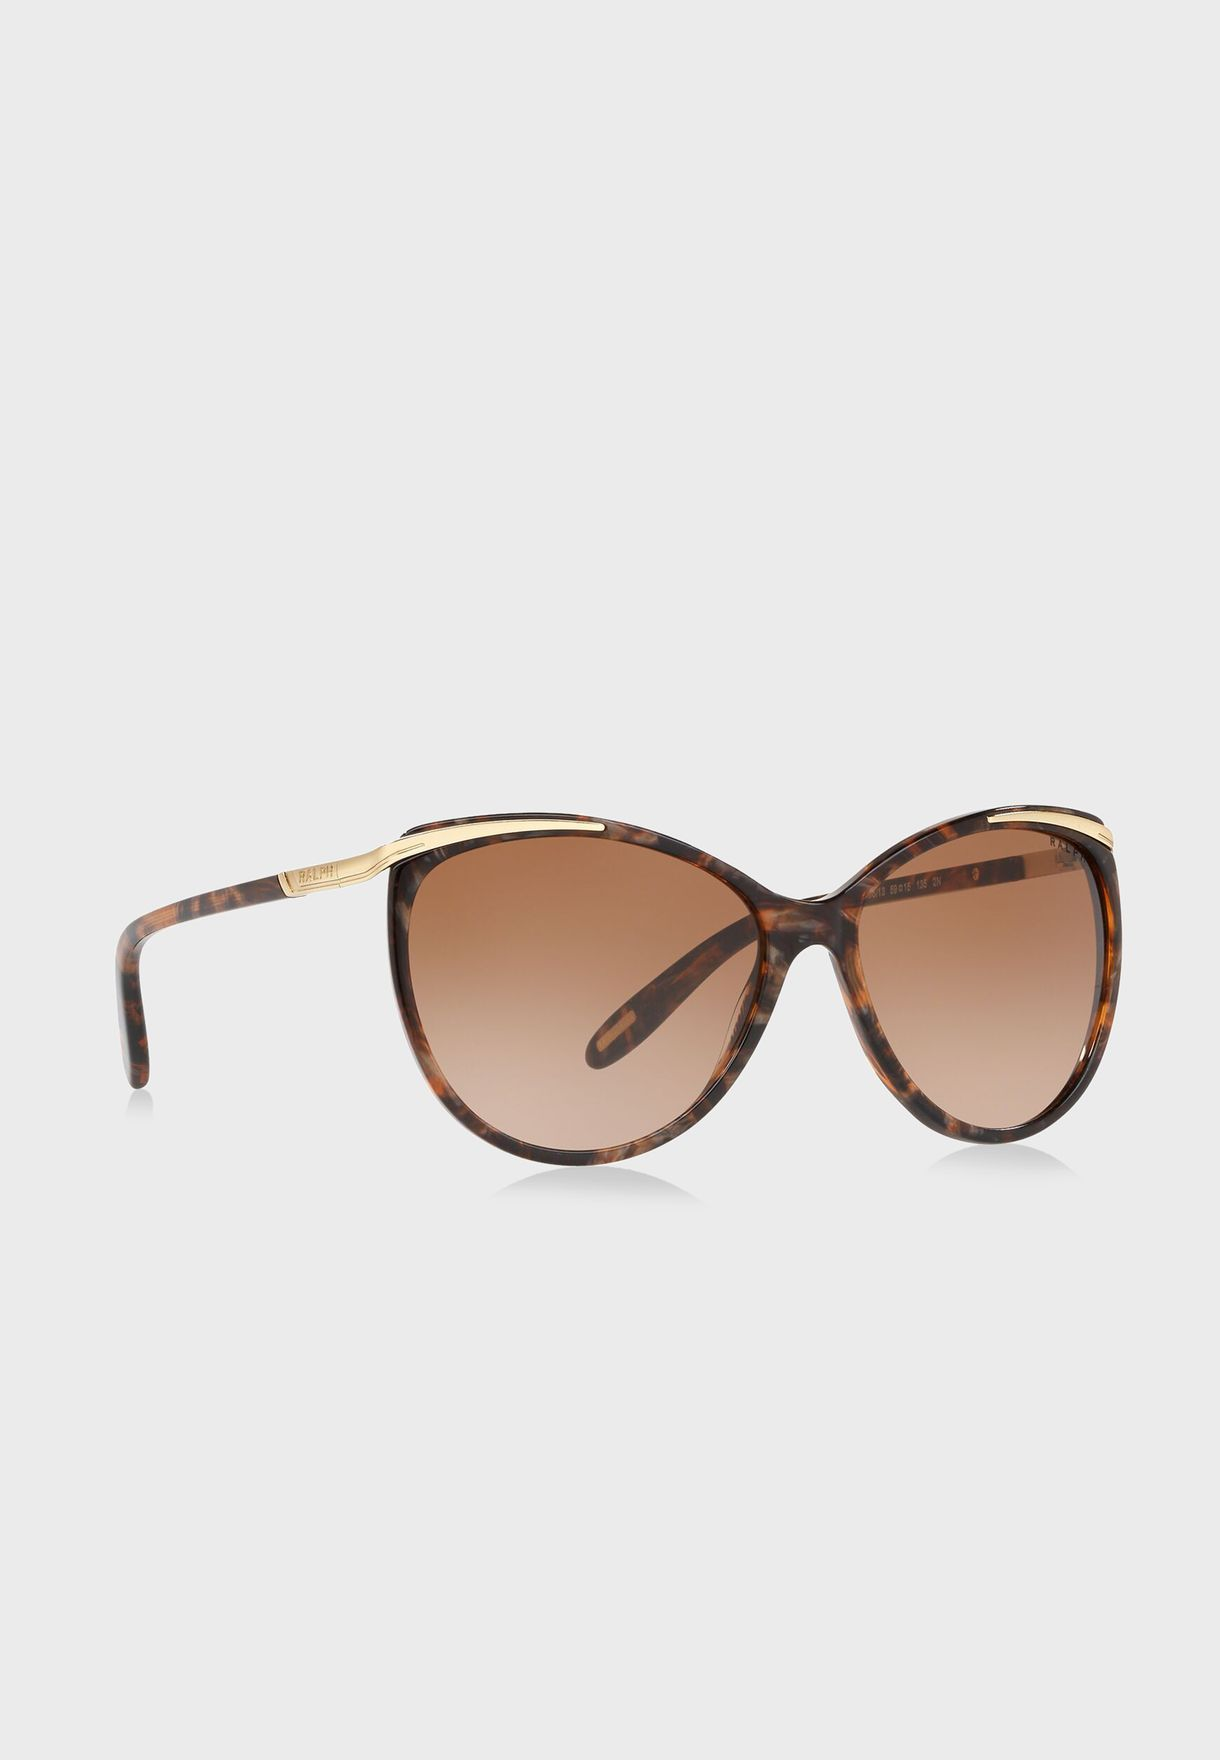 0RA5150 Cat Eye Sunglasses